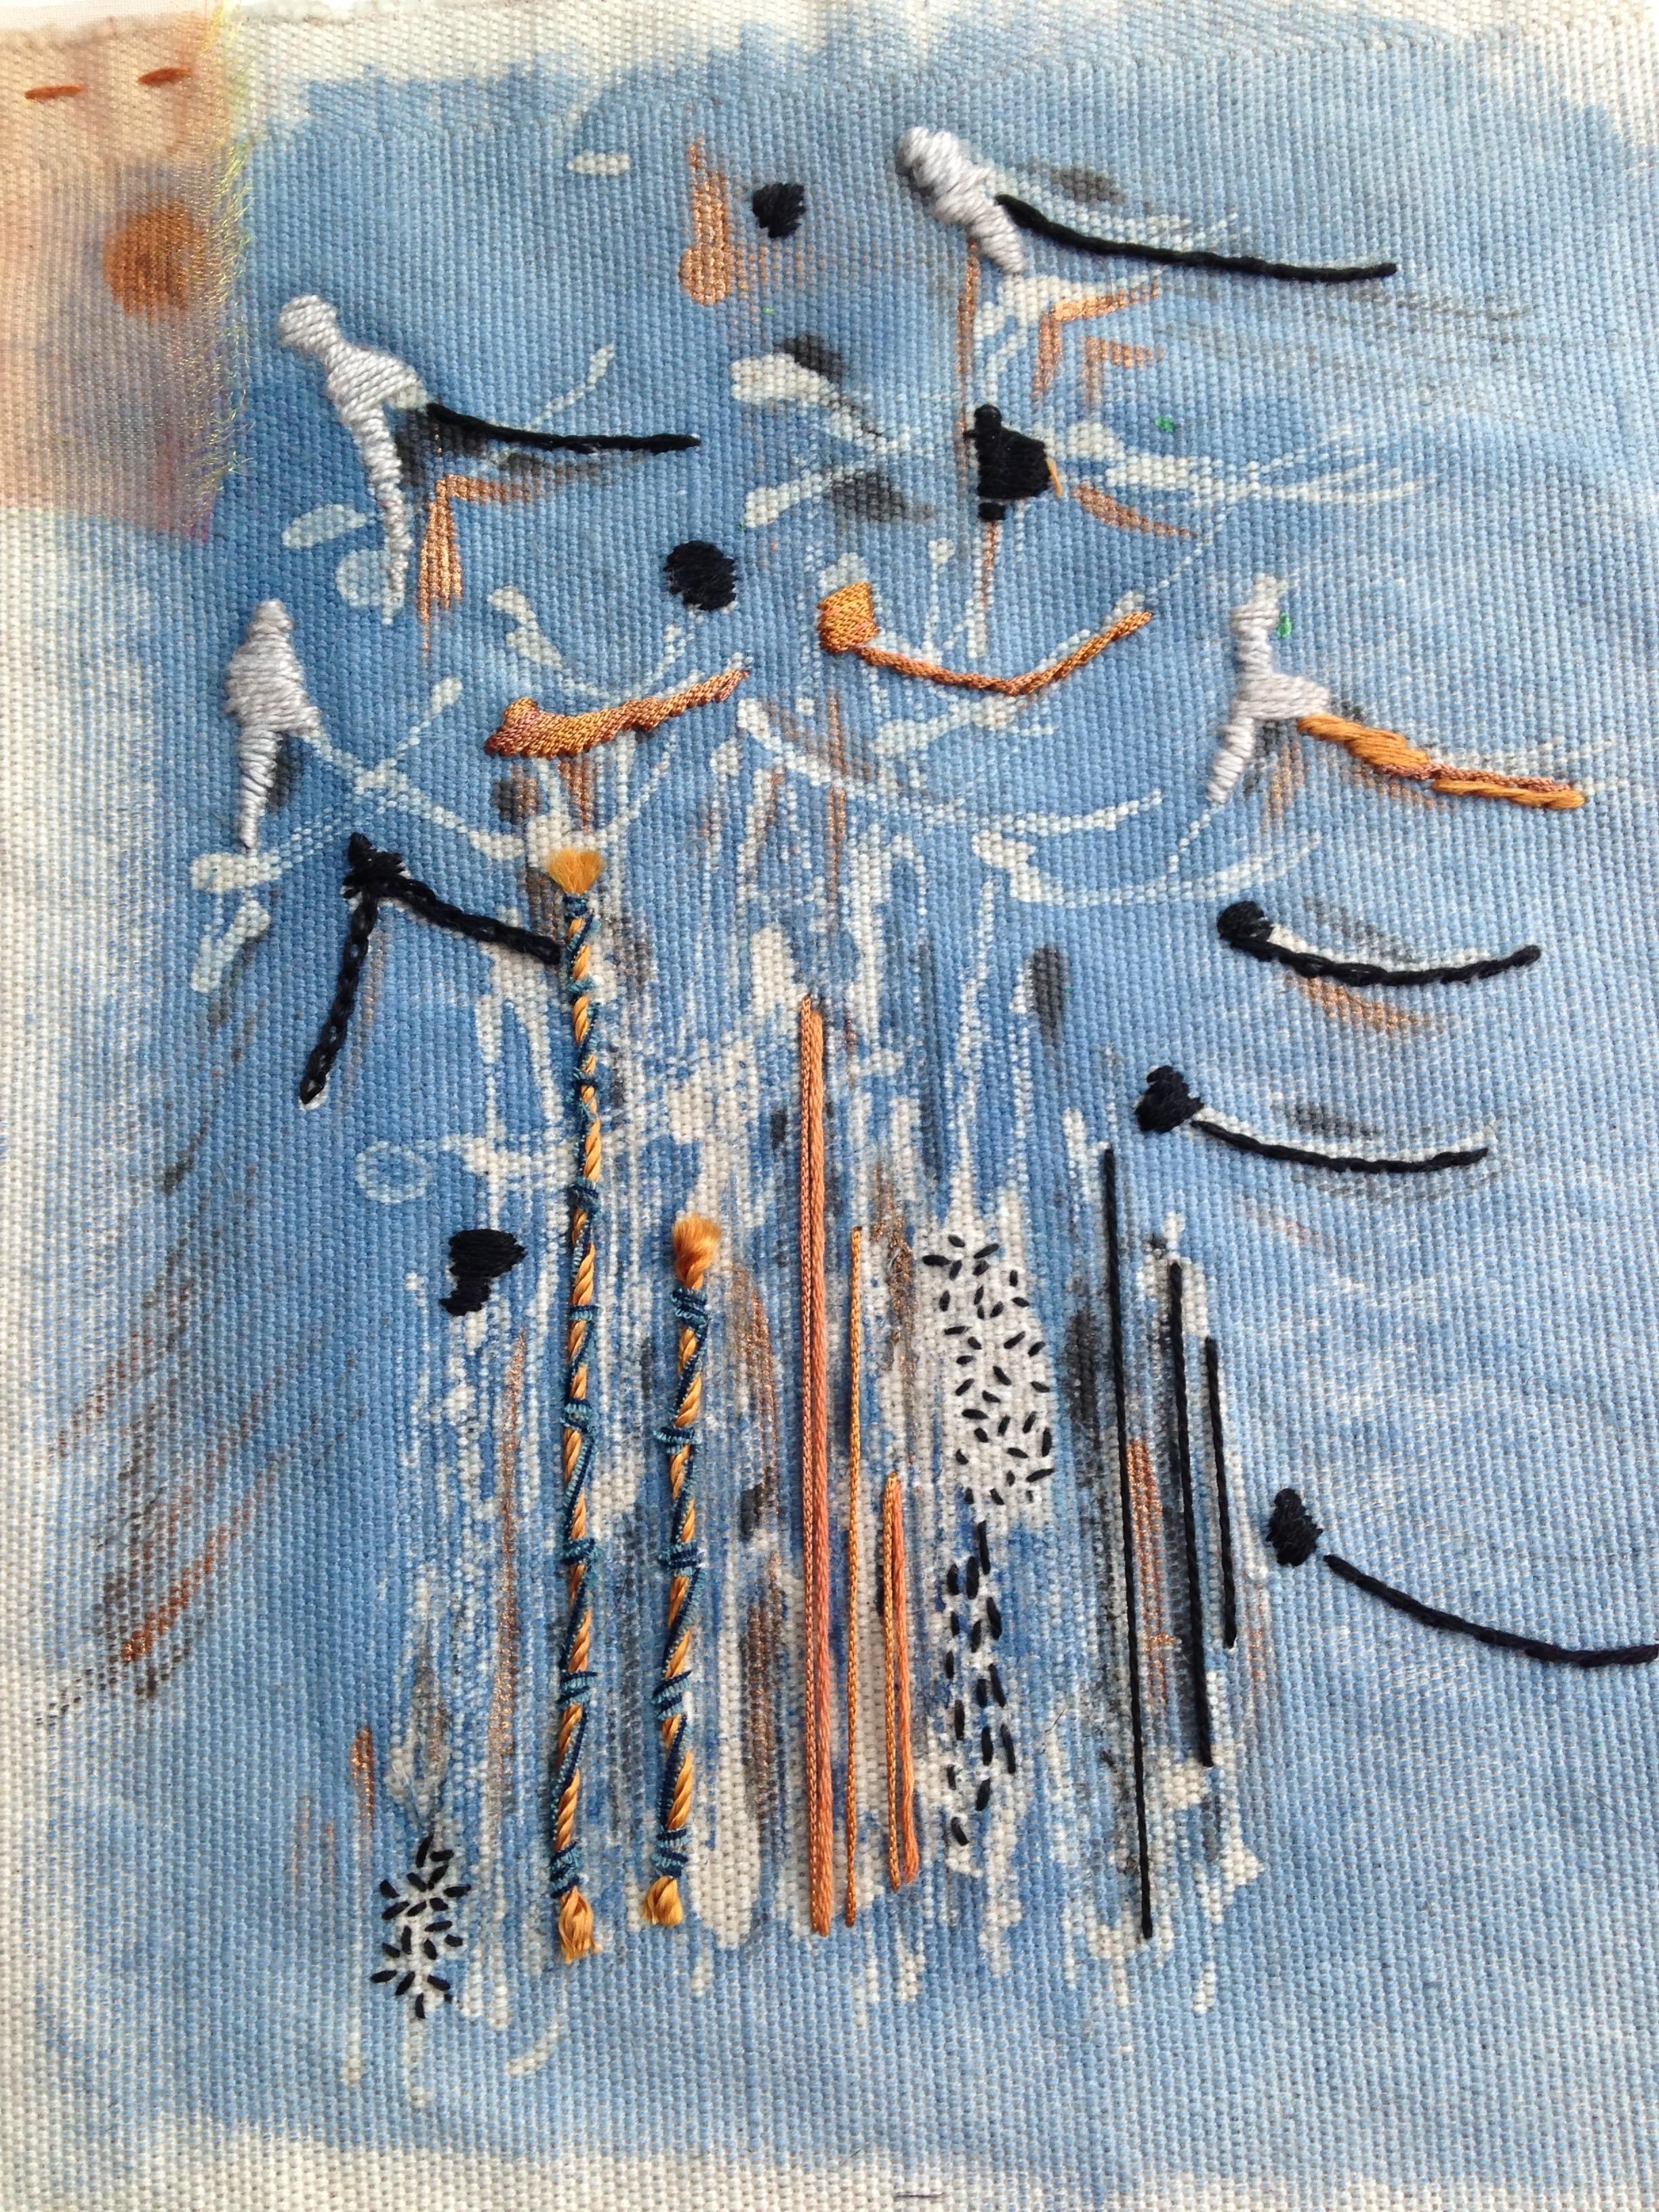 Ascent (detail), Caroline Fitzgerald, element15